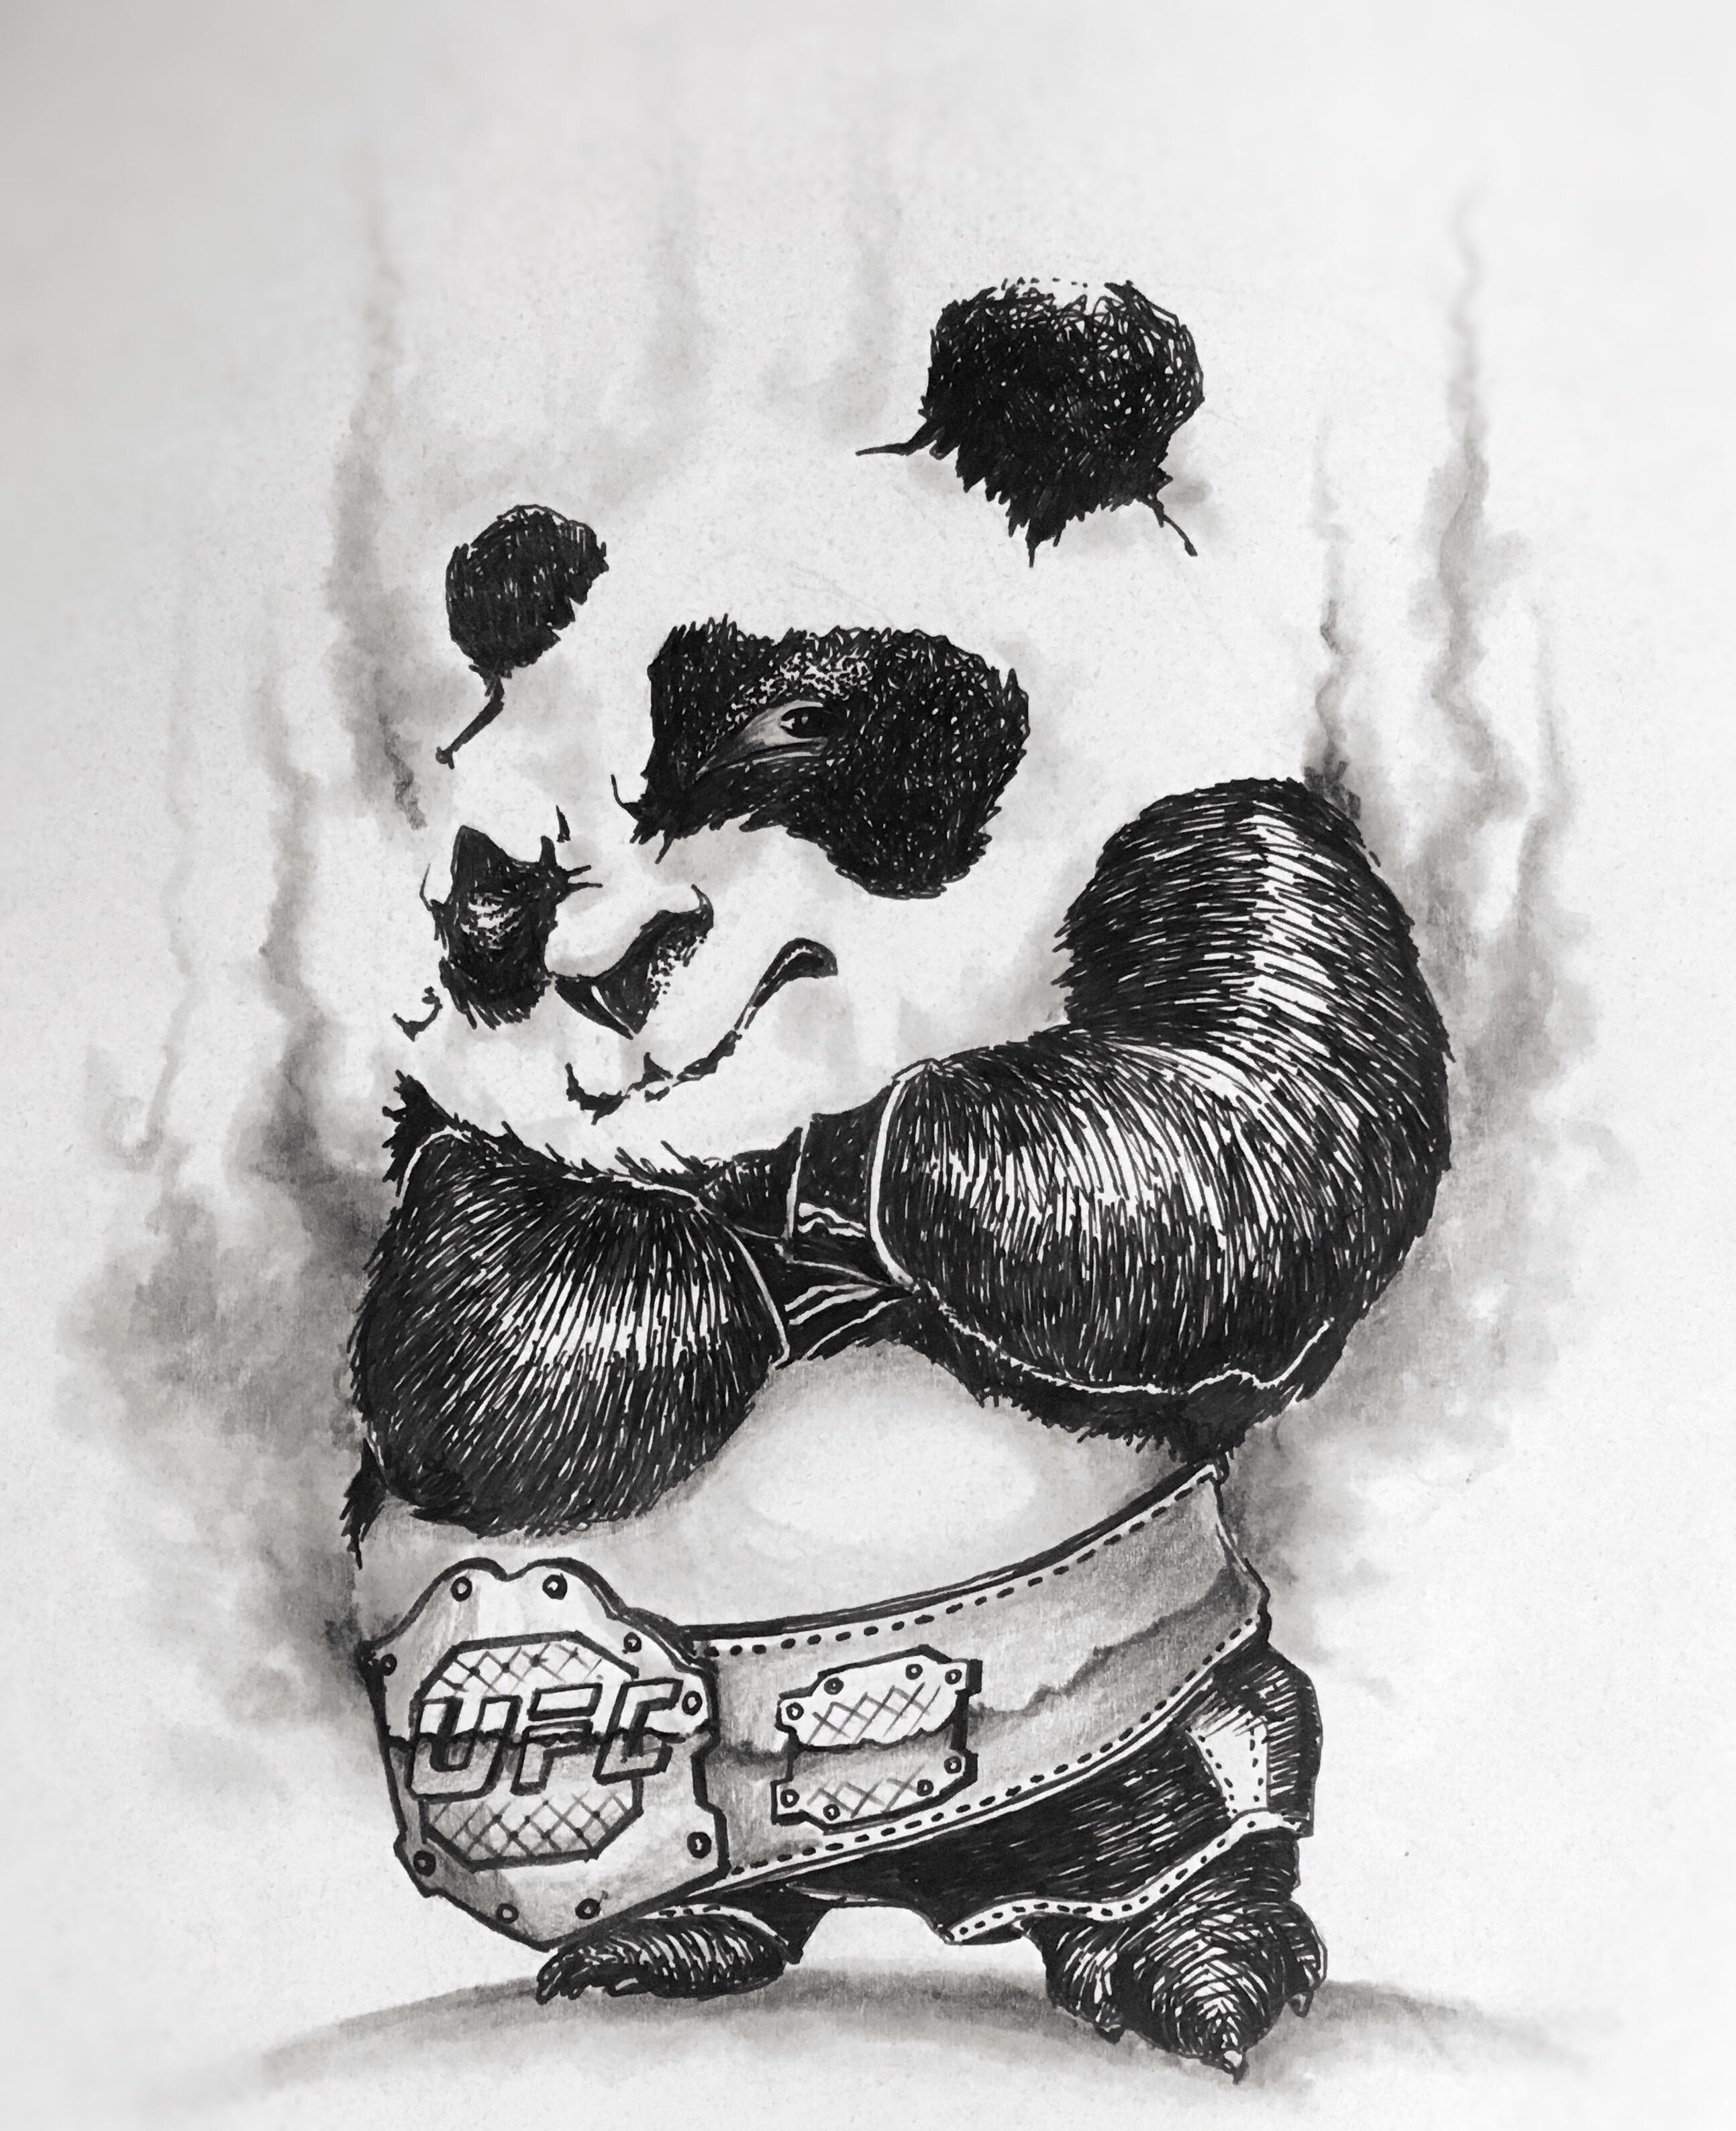 Not a lover im a bear pencil art 85x11 art pinterest not a lover im a bear pencil art 85x11 spiritdancerdesigns Choice Image